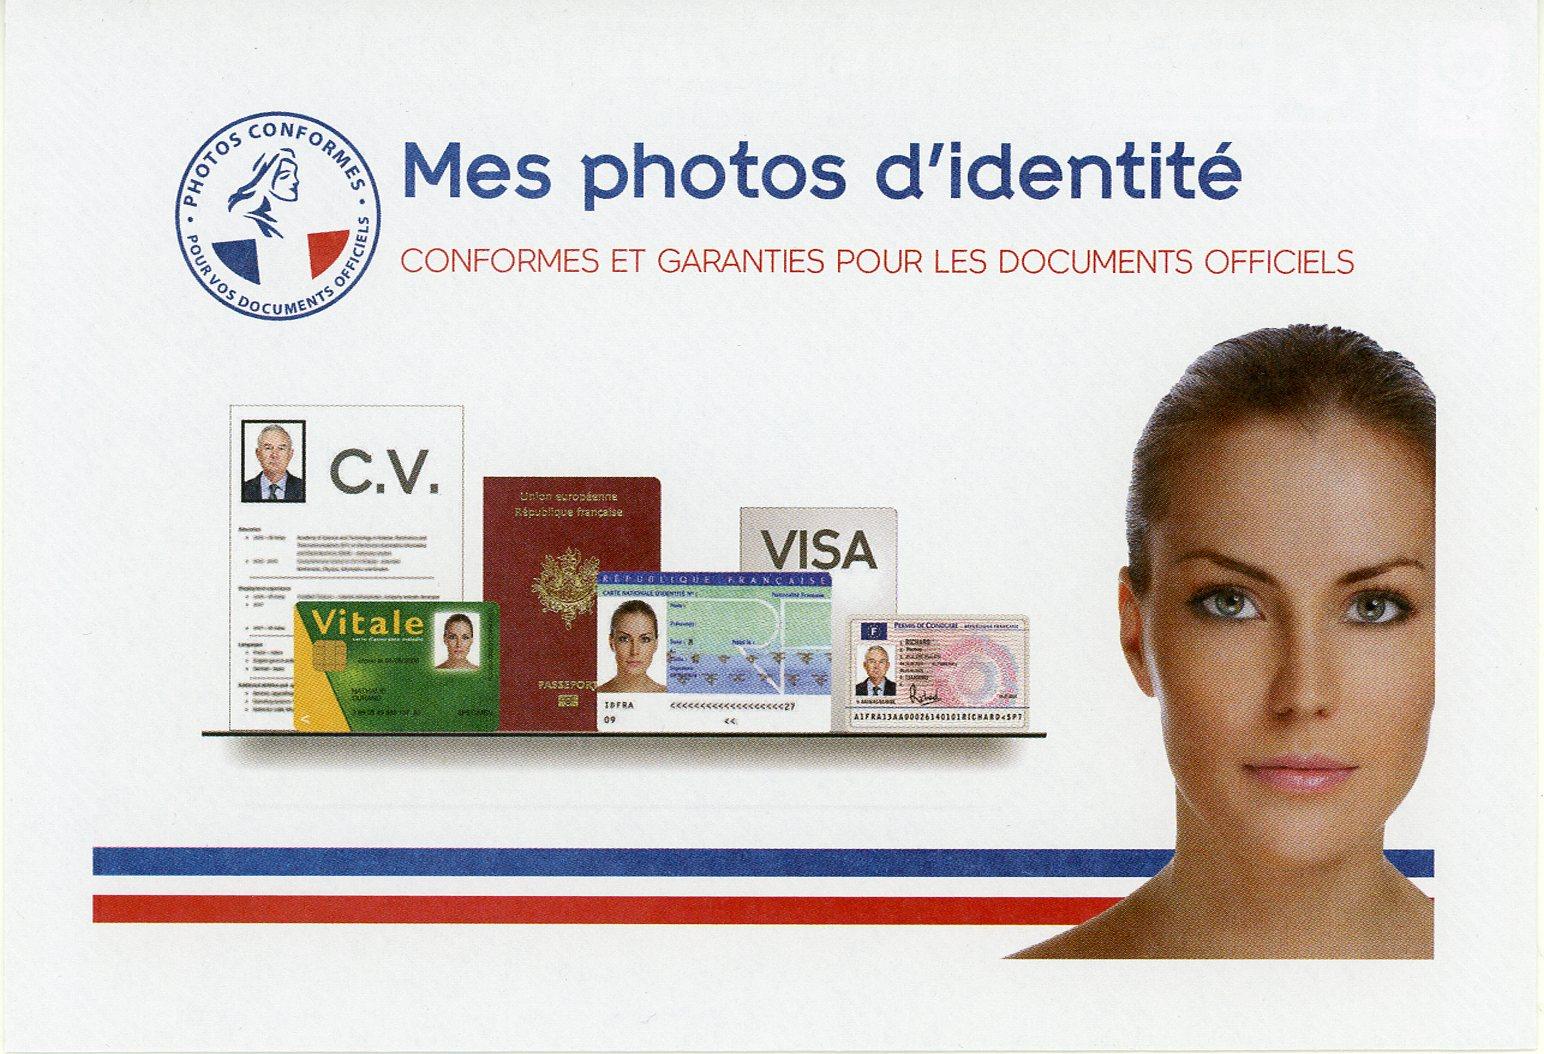 photos d u0026 39 identit u00e9 pour permis  carte d u0026 39 identit u00e9  passeport